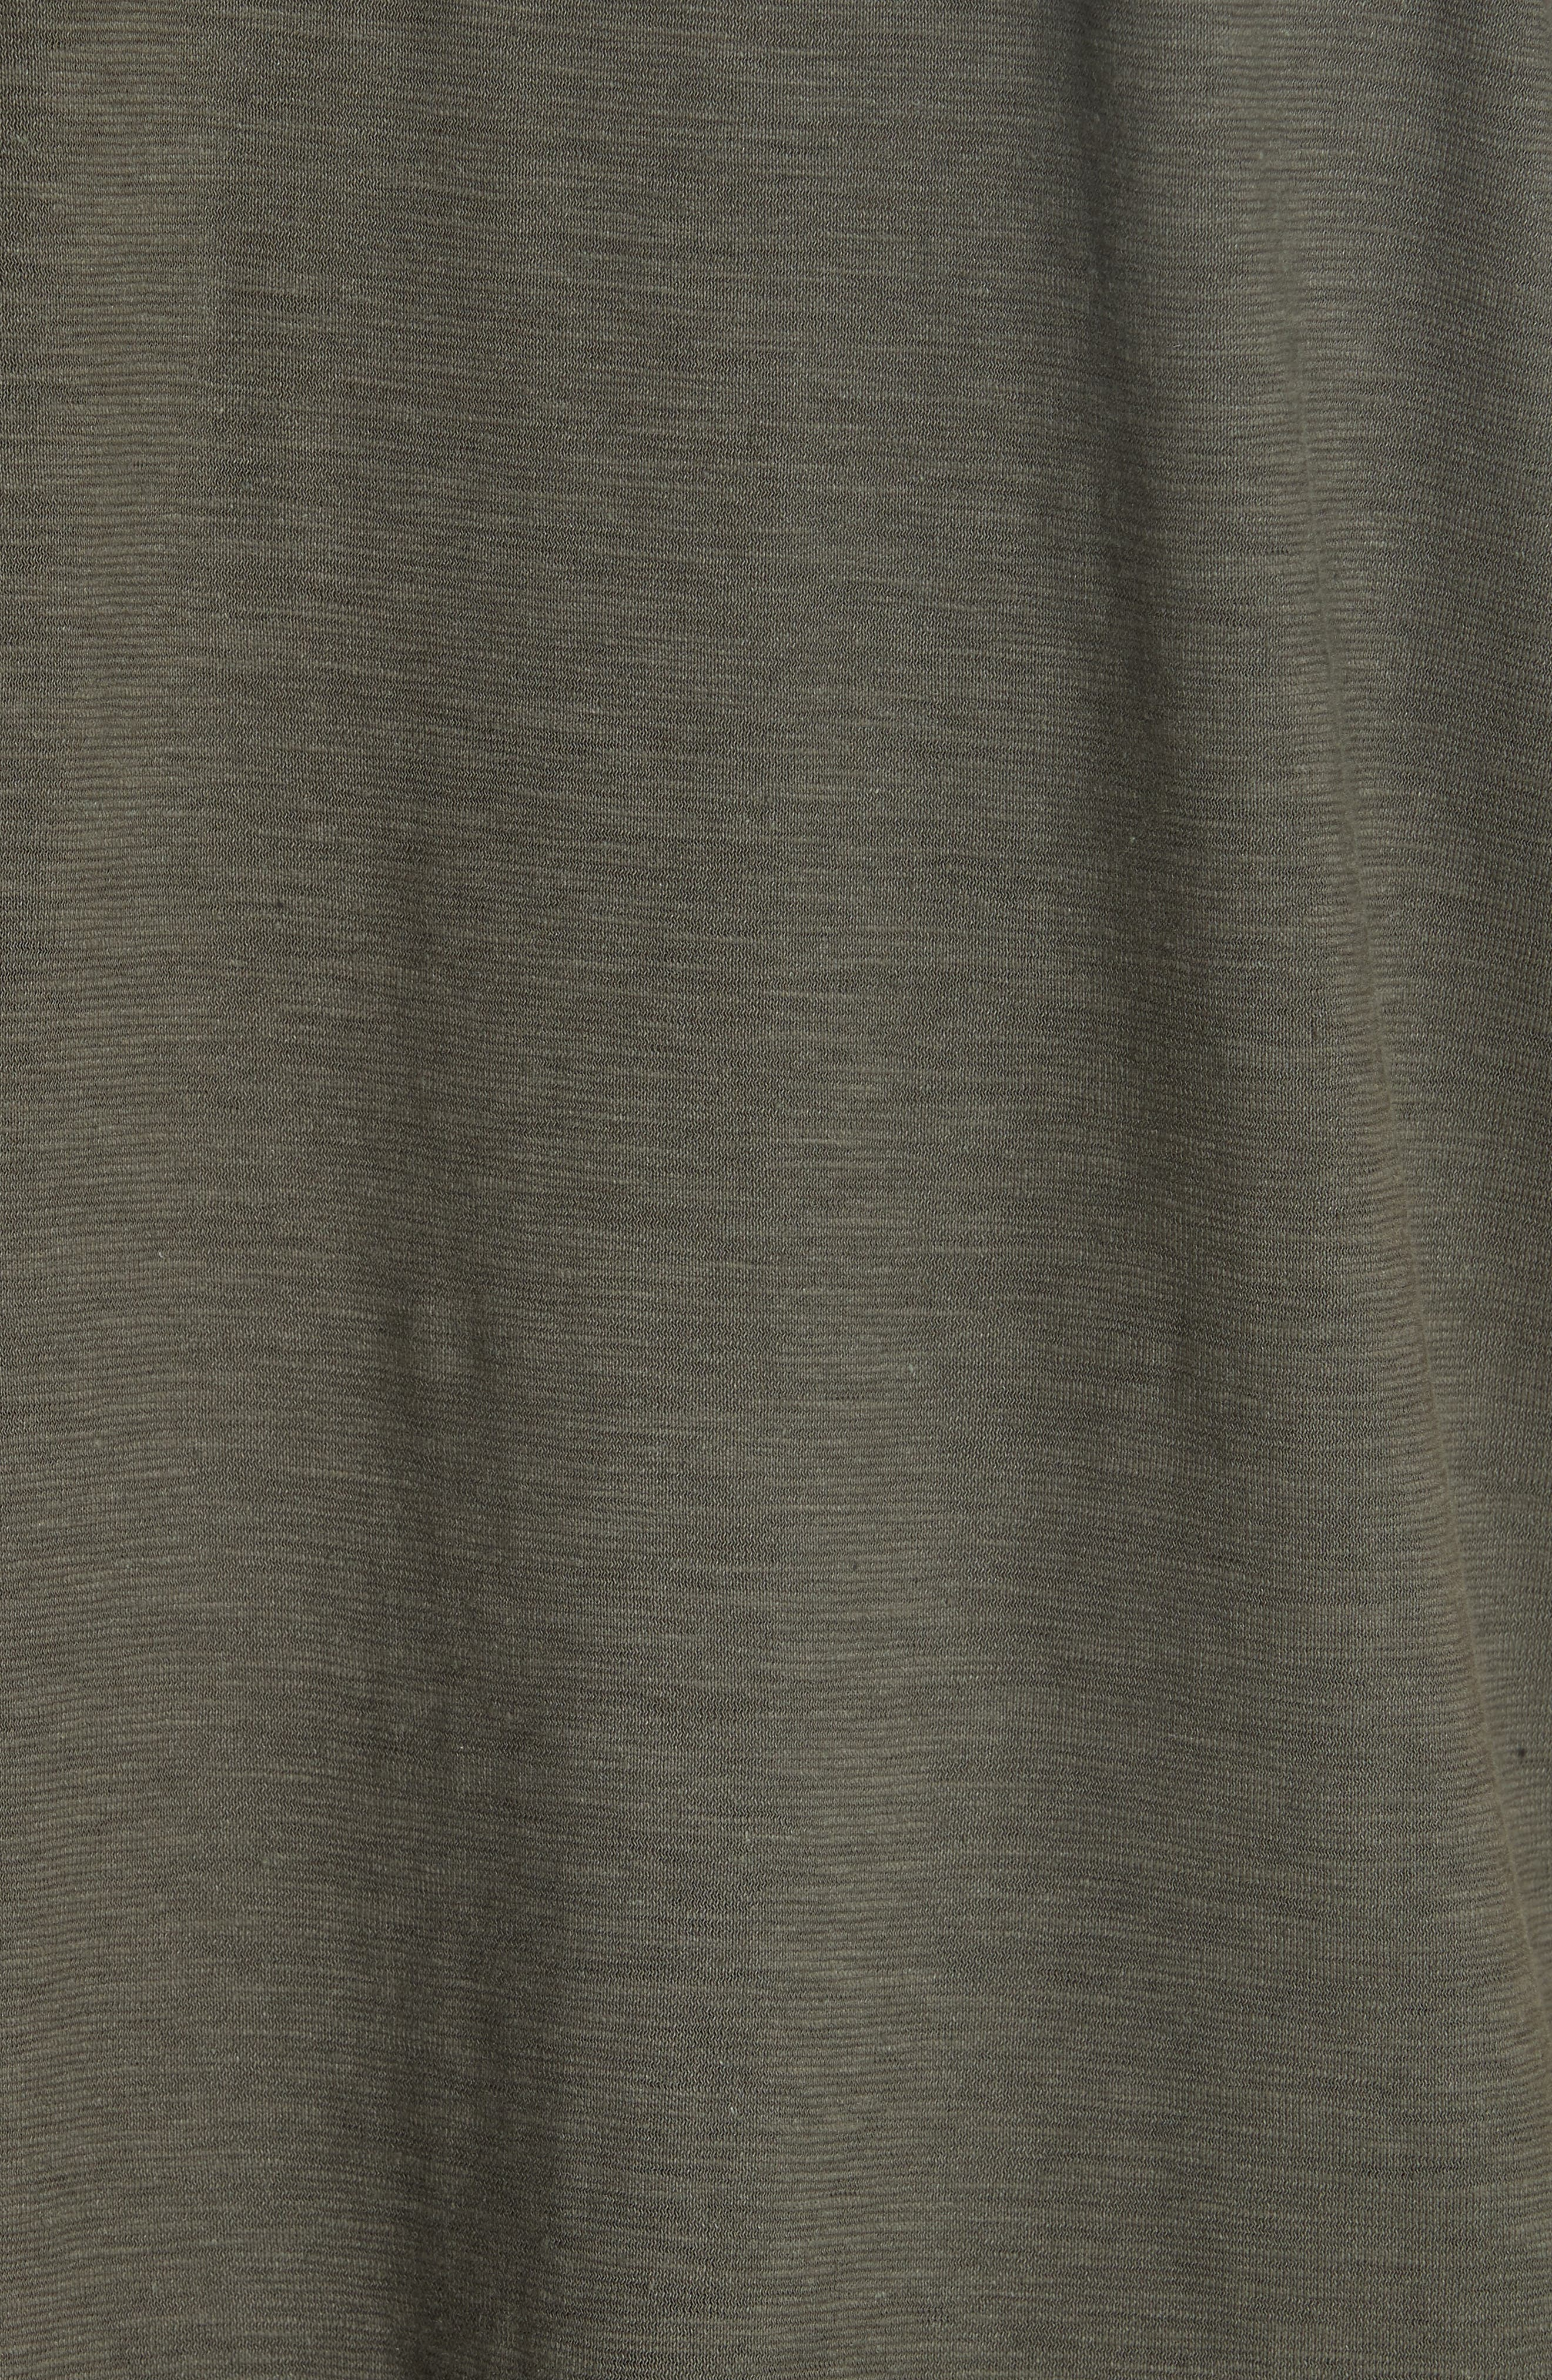 Hemp & Organic Cotton Top,                             Alternate thumbnail 6, color,                             Oregano